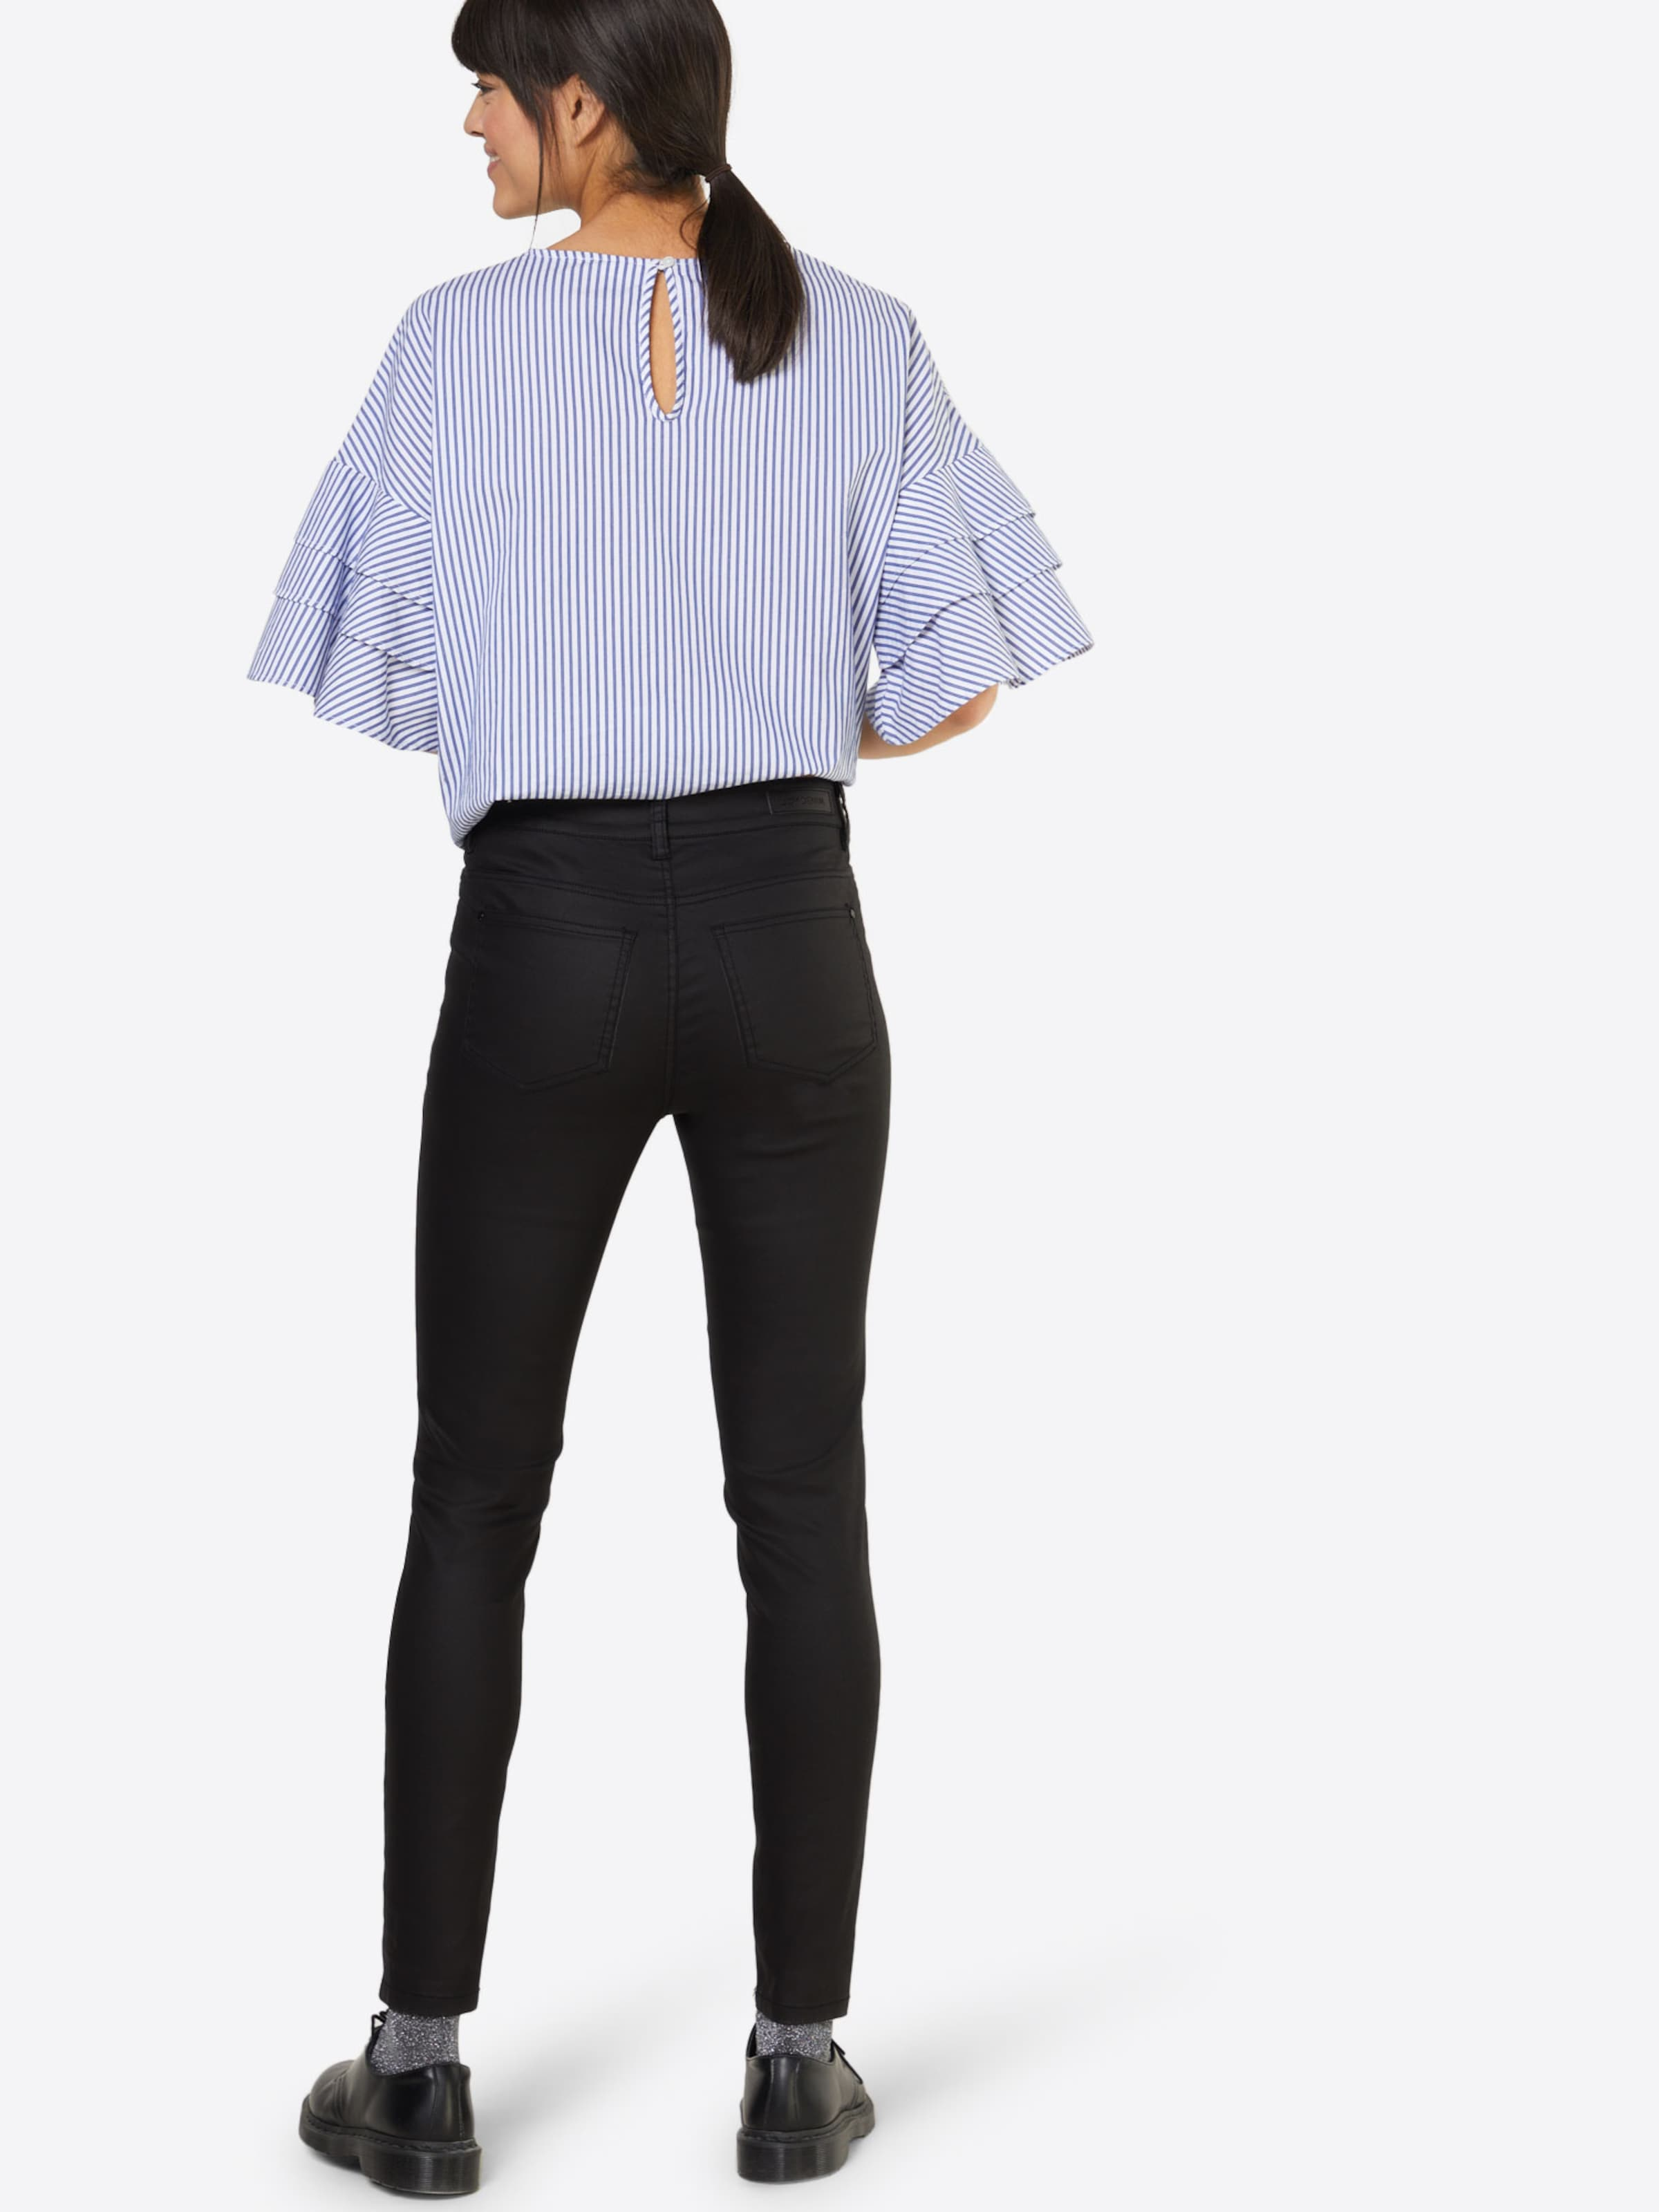 Jacqueline Yong De Pantalon En Noir D2HWE9I